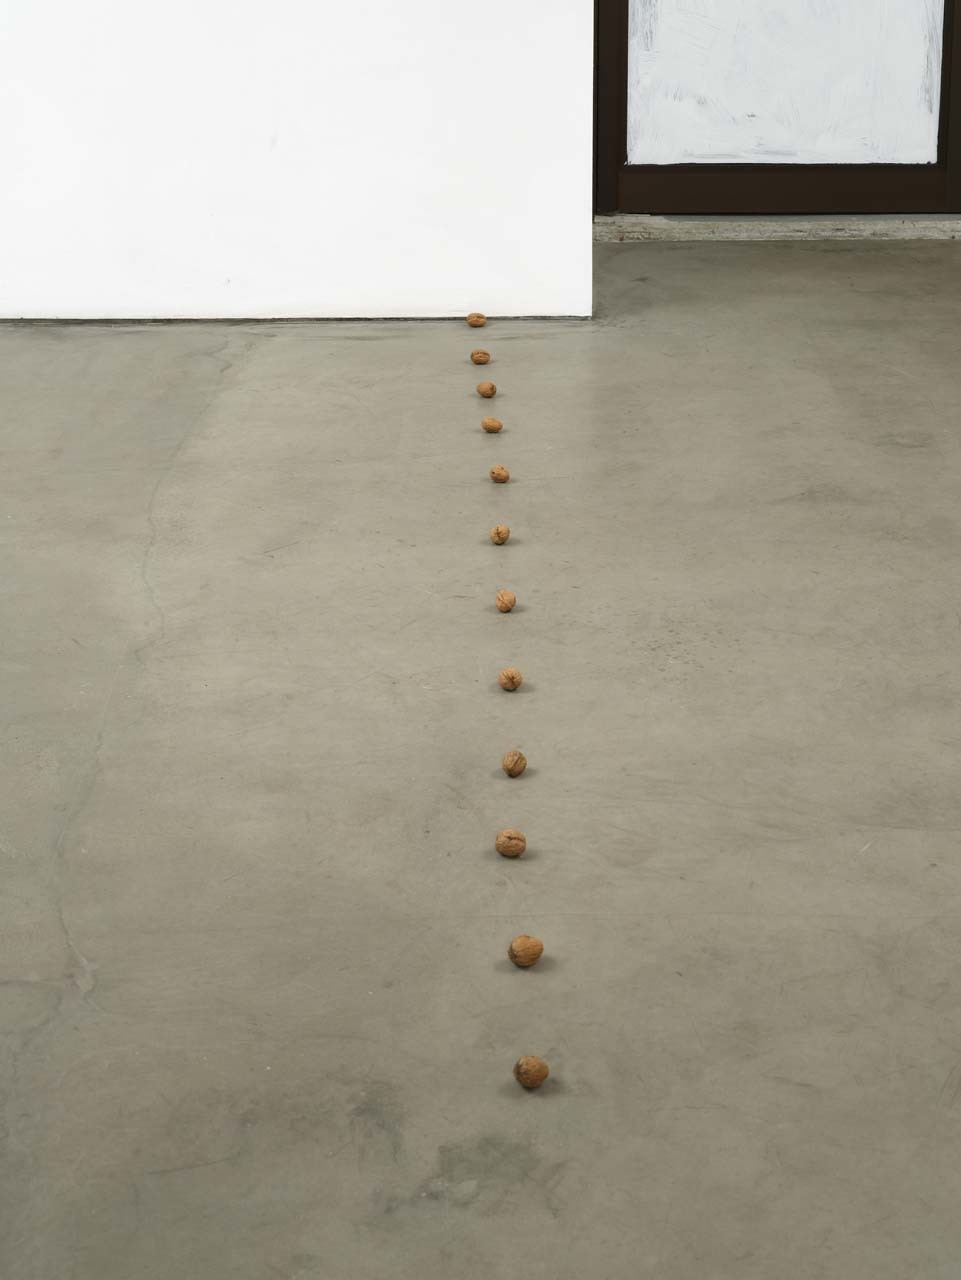 "<div class=""artwork_caption""><p>still.life. (twelve walnuts in a line), 2009</p></div>"